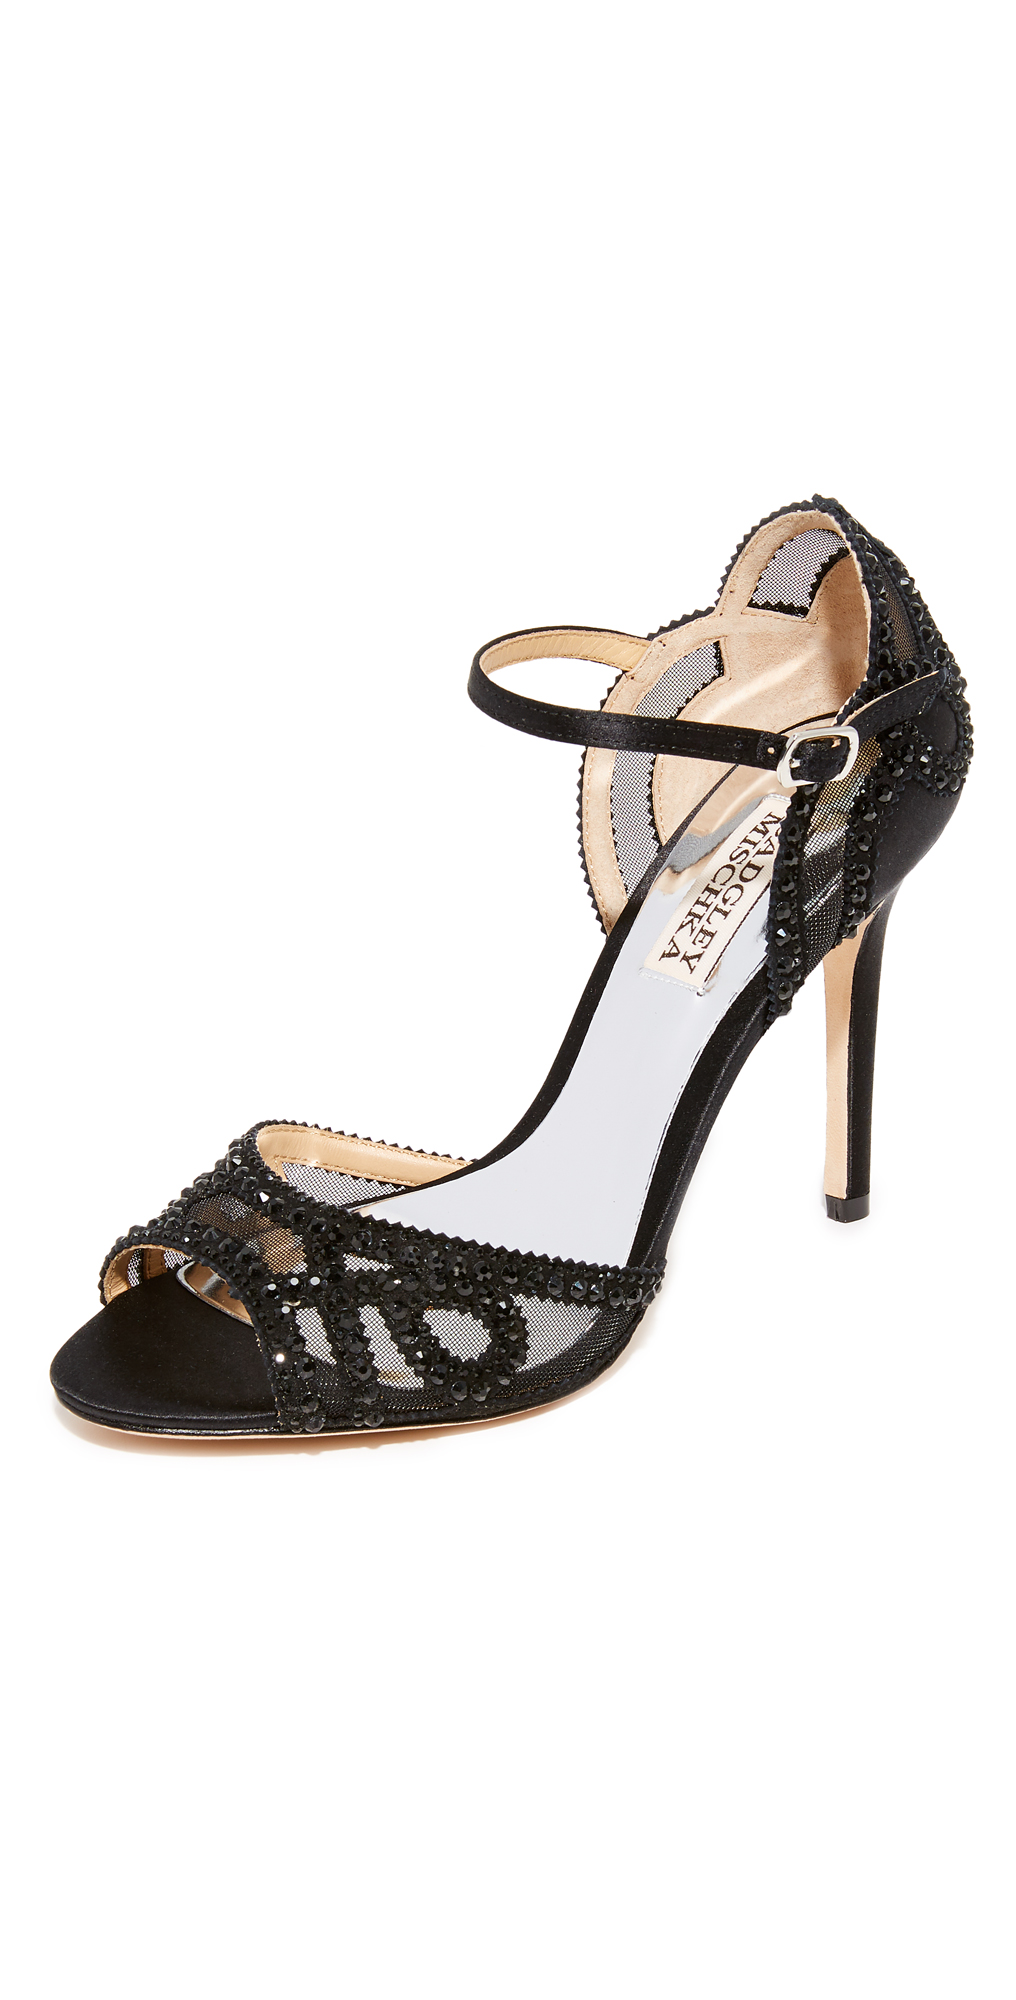 Tansy Sandals Badgley Mischka